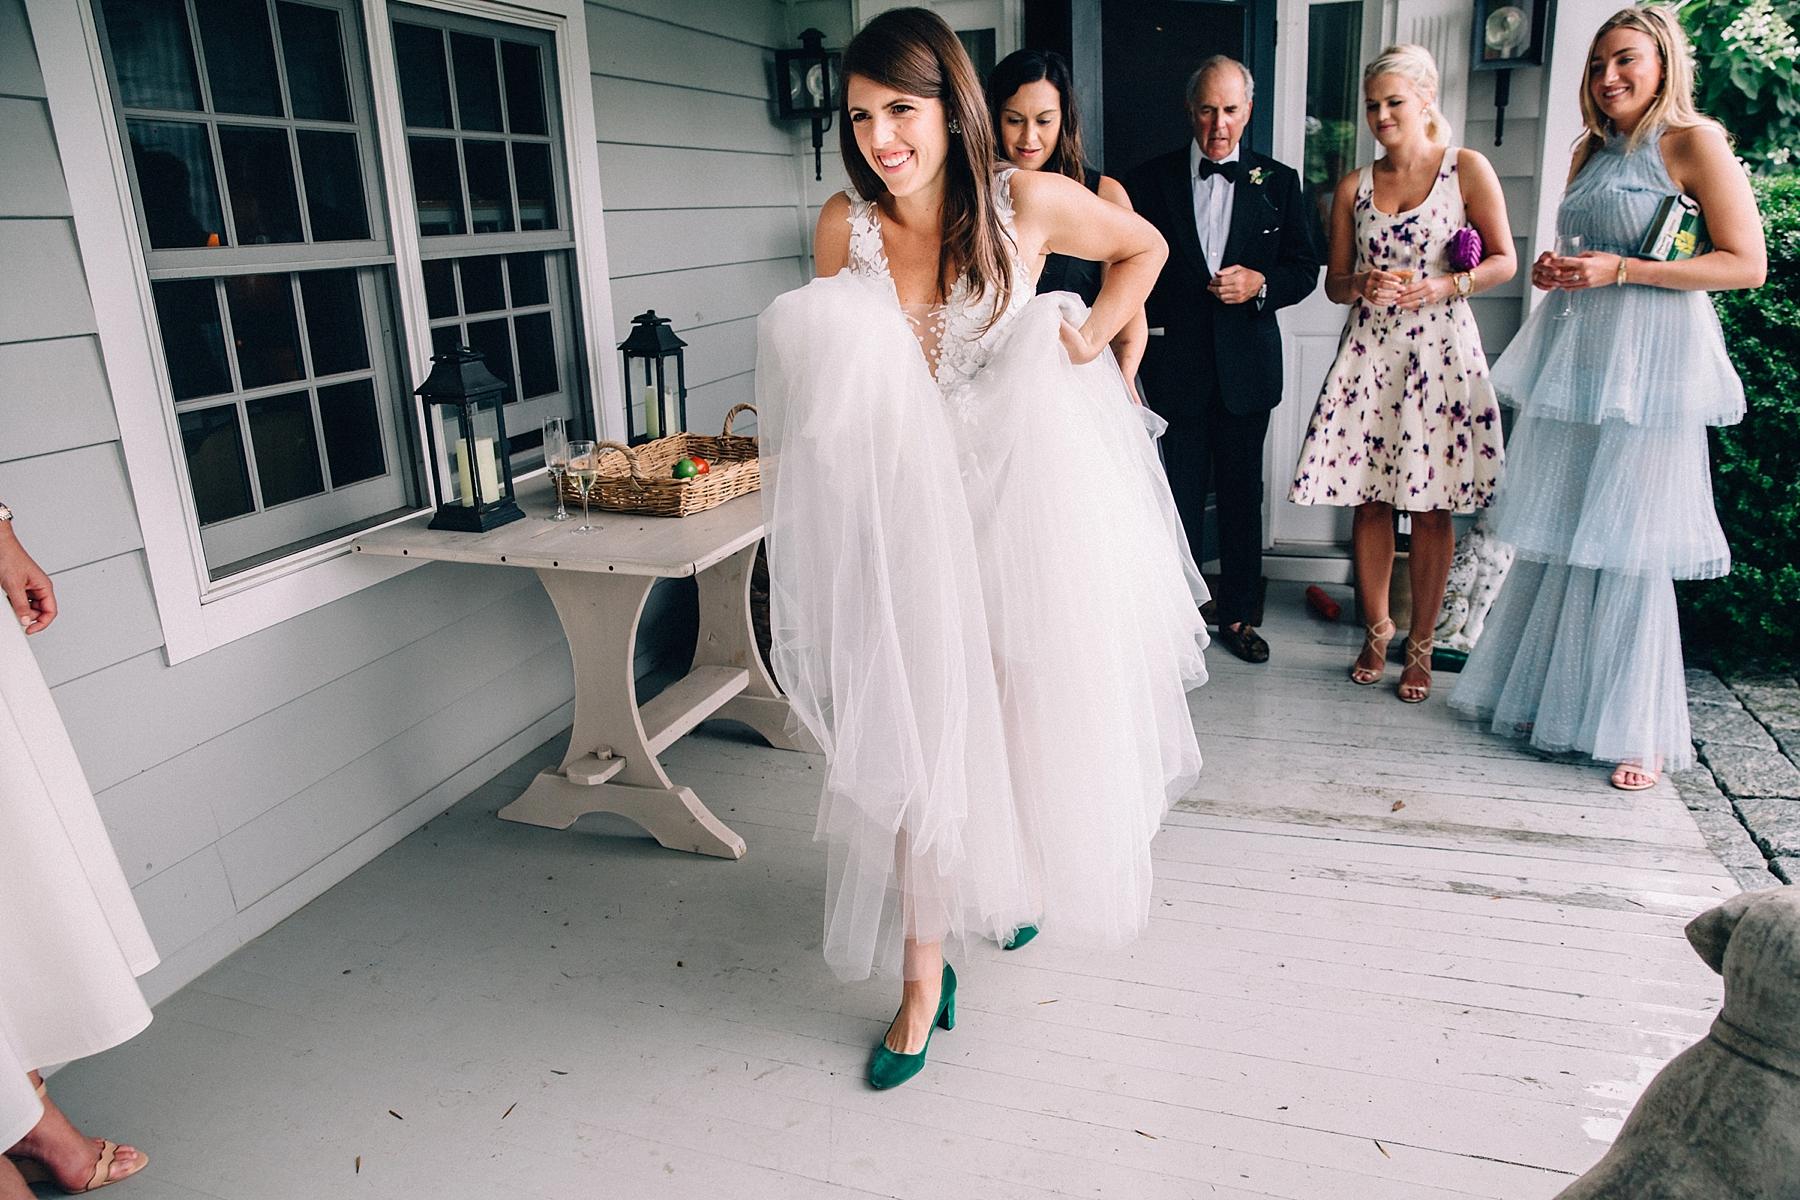 mashomack-preserve-polo-club-wedding-ny-photographer_0031.jpg